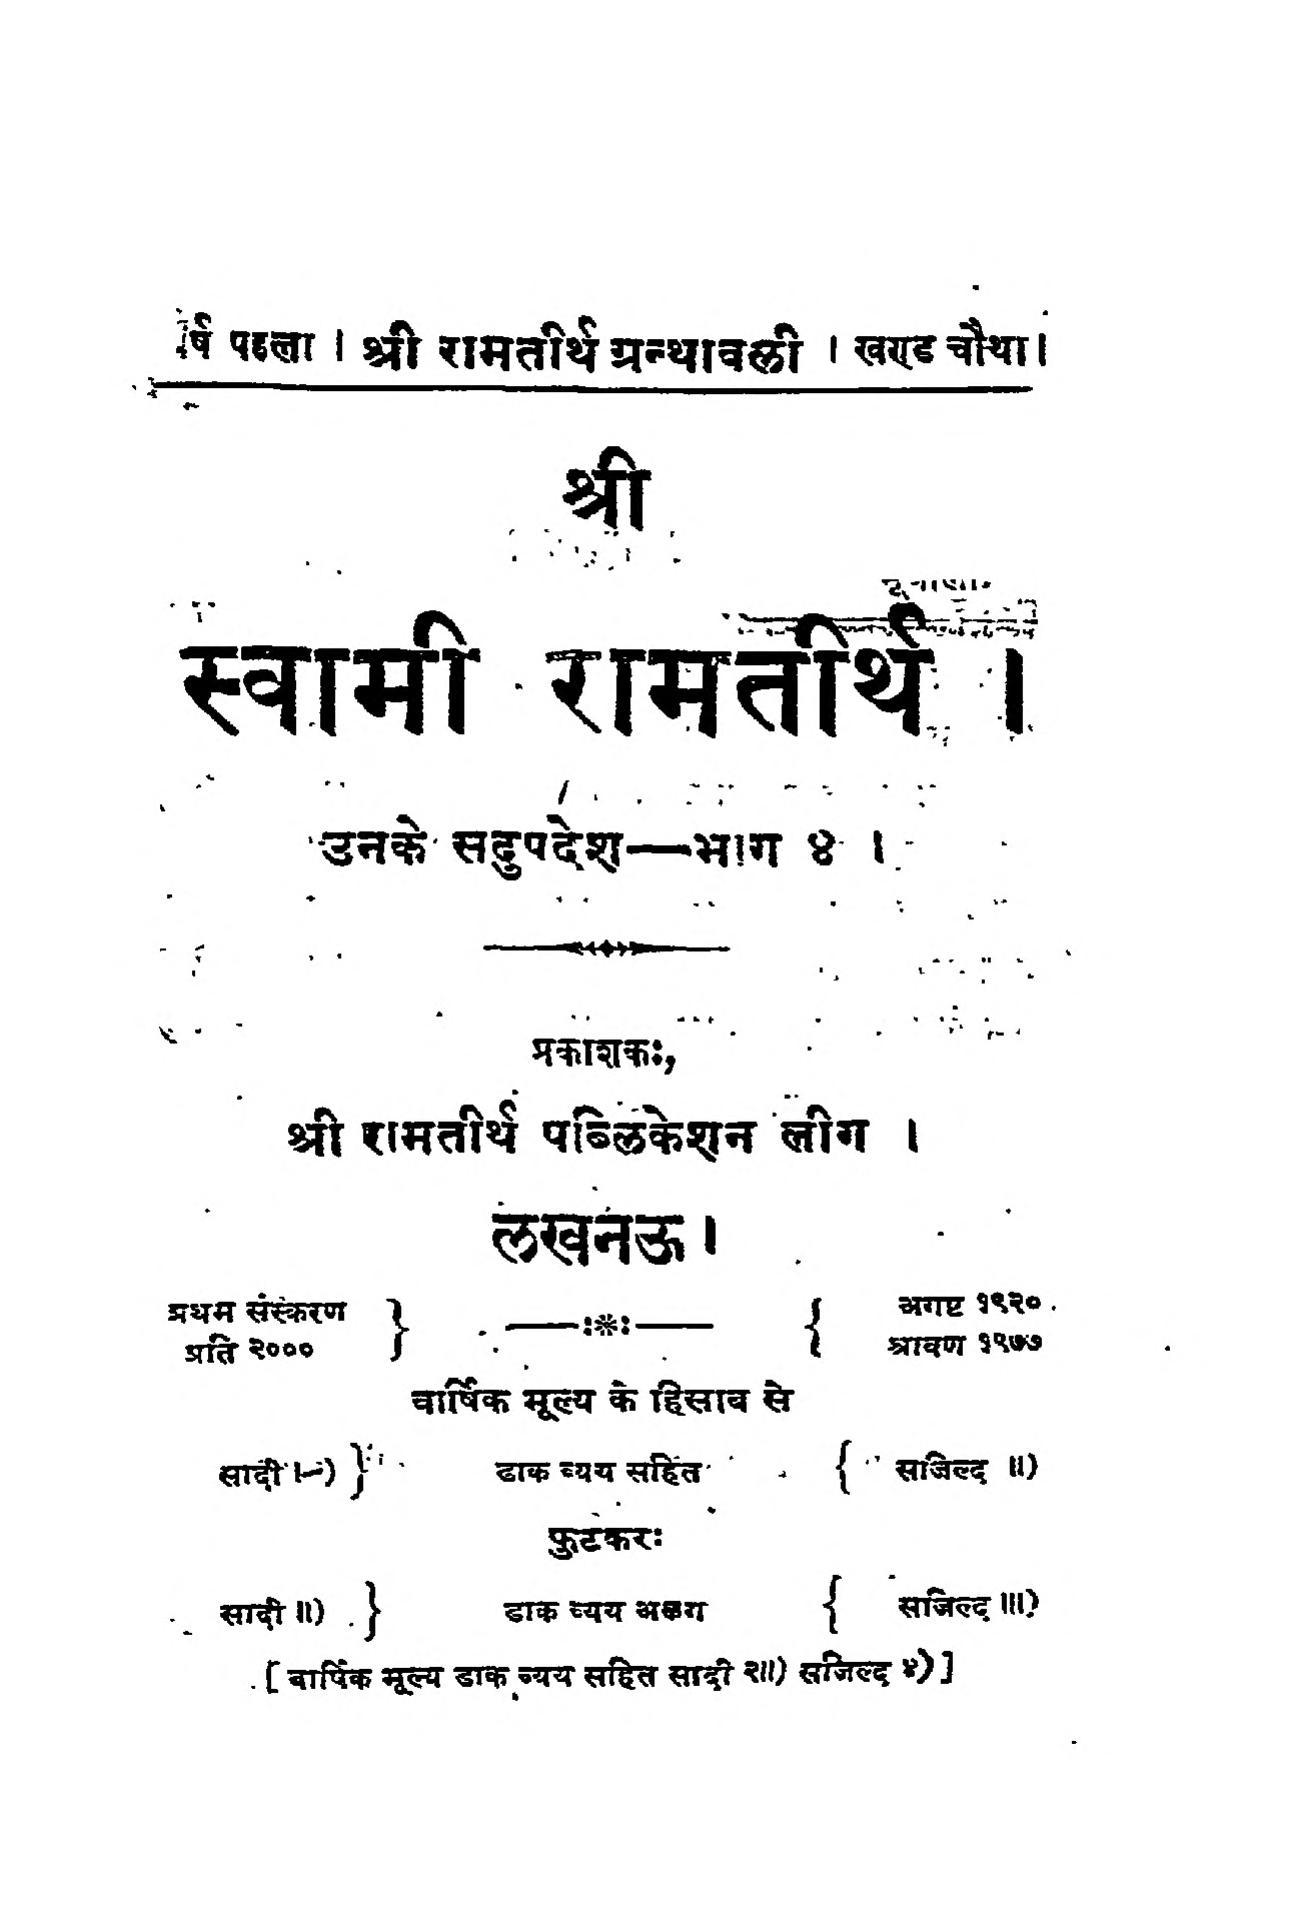 Book Image : स्वामी रामतीर्थ भाग 4 - Swami Ramtirth Bhag 4